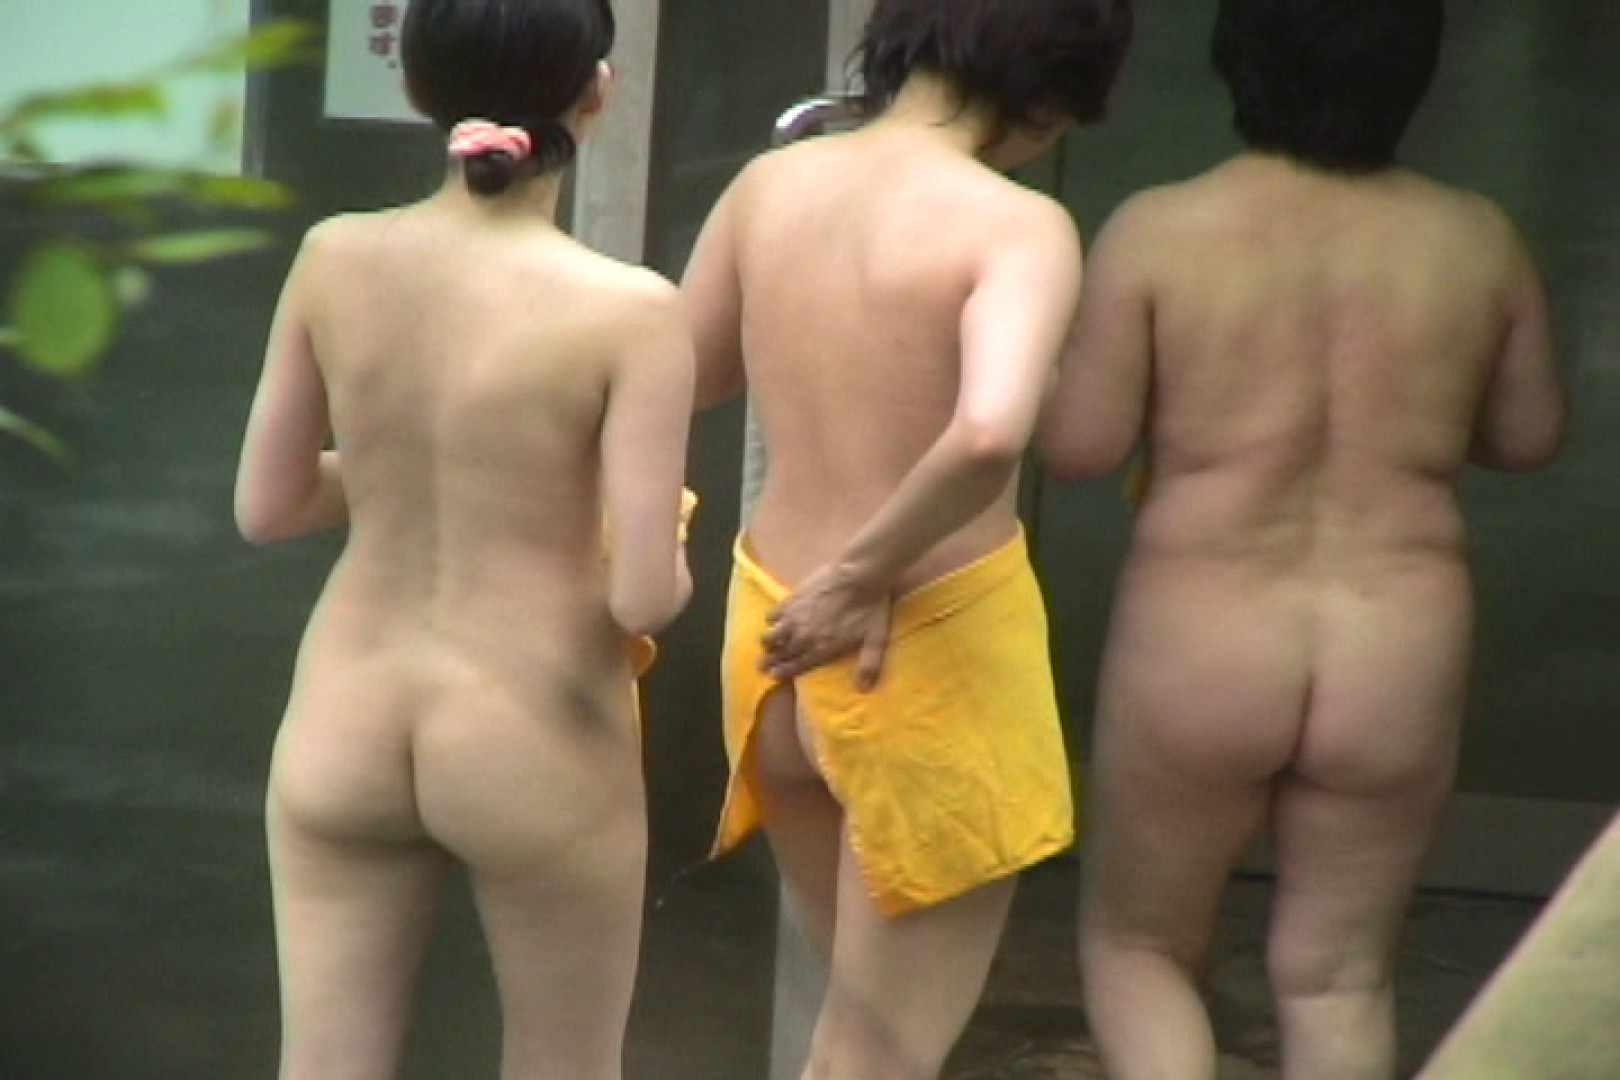 Aquaな露天風呂Vol.700 盗撮シリーズ | 露天風呂編  97PIX 39